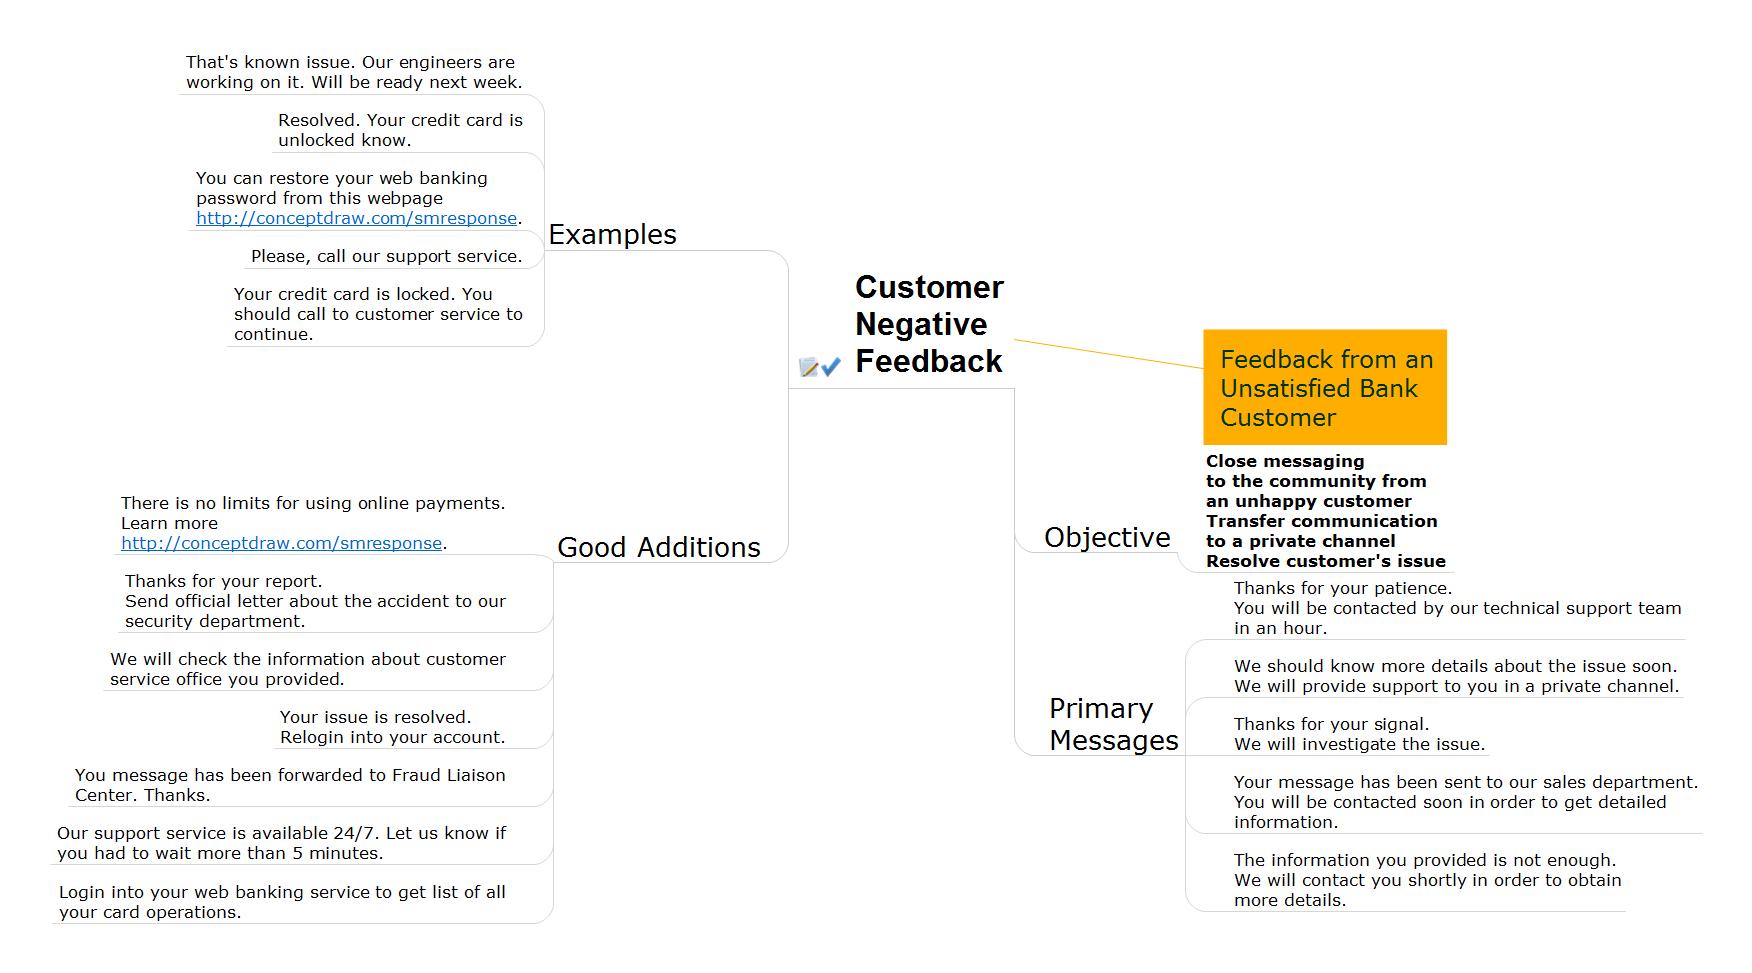 Response to Customer Negative Feedback - Bank customer negative feedback